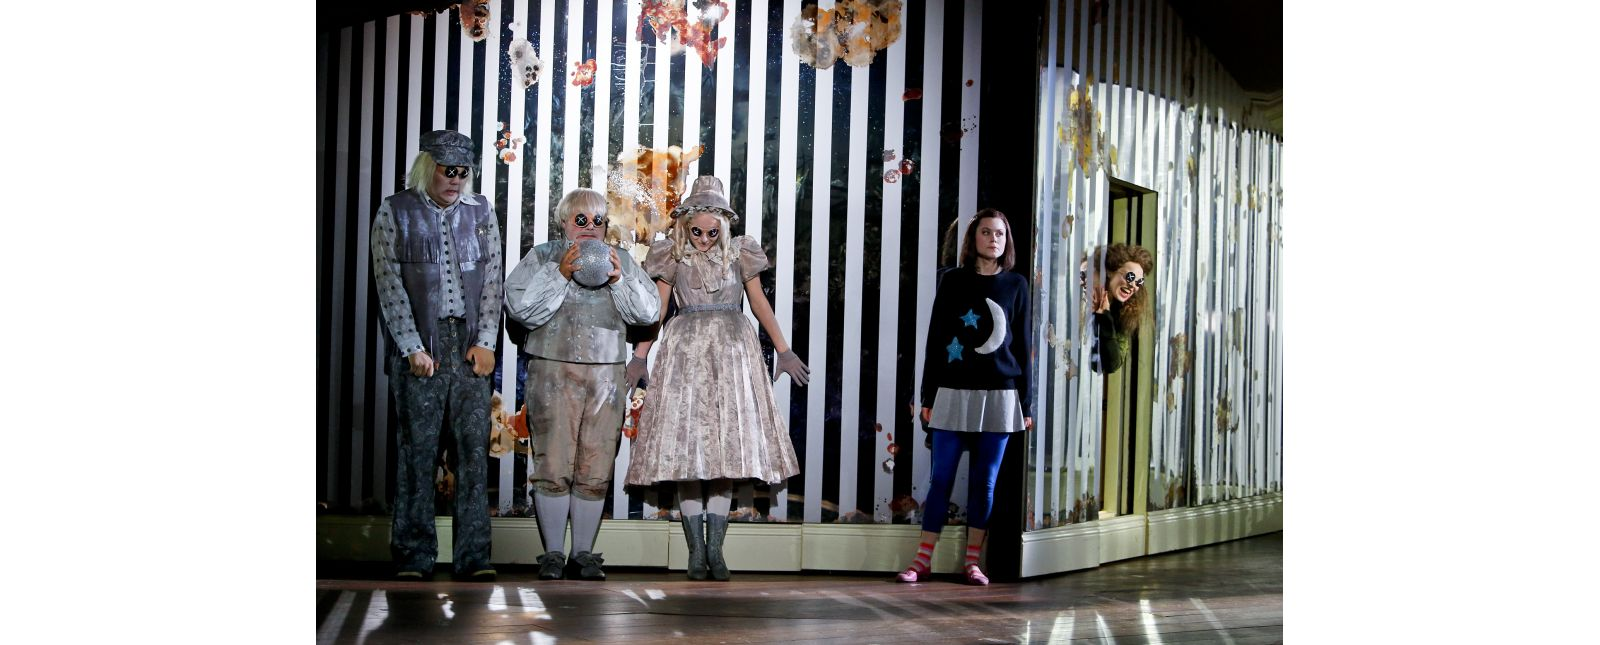 Coraline // Daeho Kim // Roberto Gionfriddo // Amelie Petrich // Samantha Gaul // Inga Schäfer // 2018 // Birgit Hupfeld